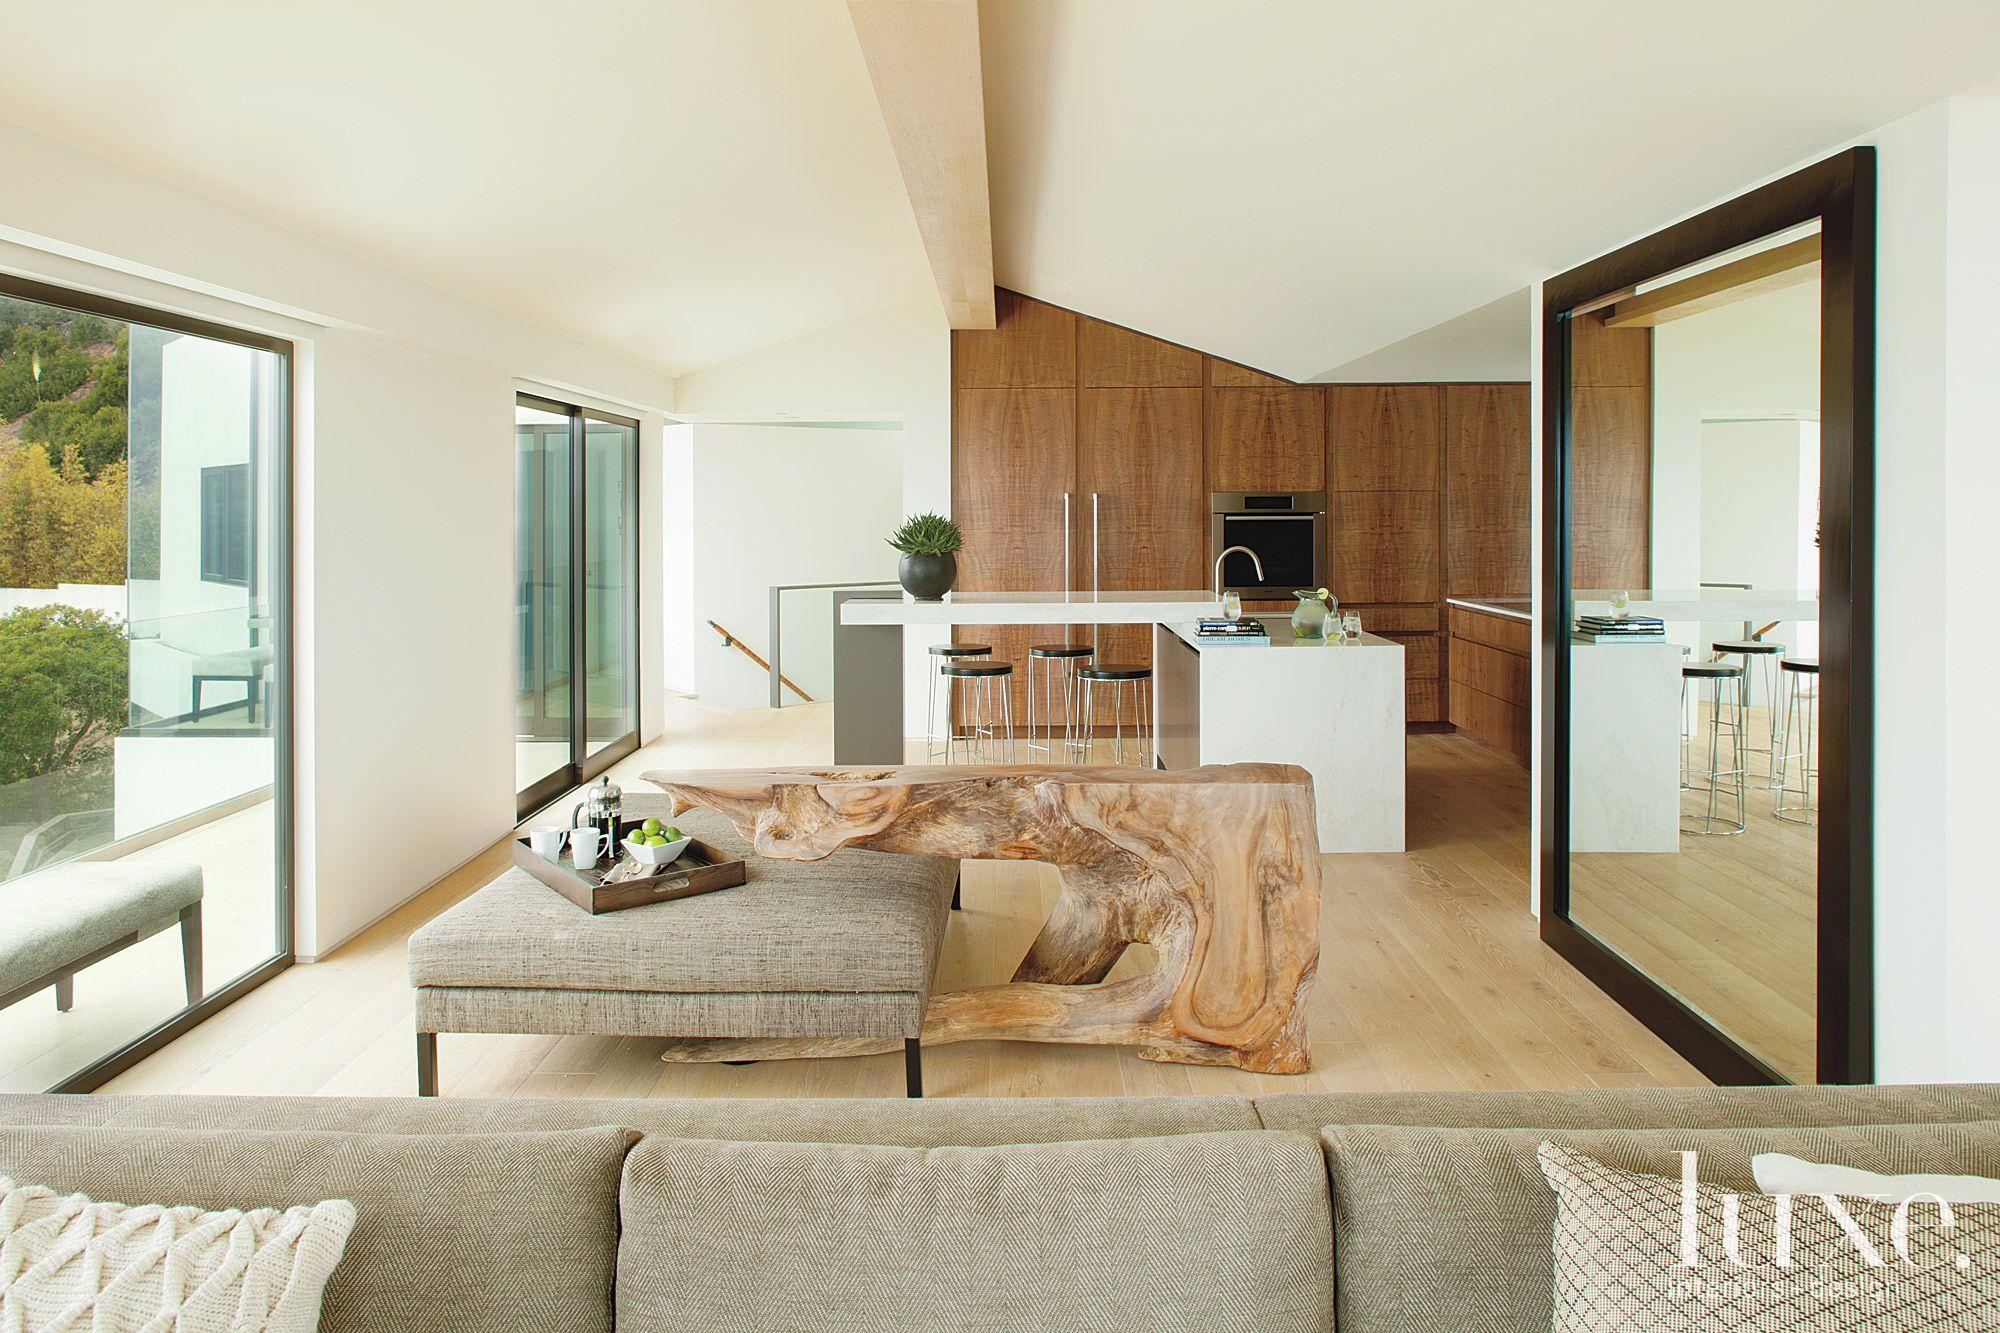 Bedroom interior roof honest strippeddown materialsuconcrete salvaged wood rammed